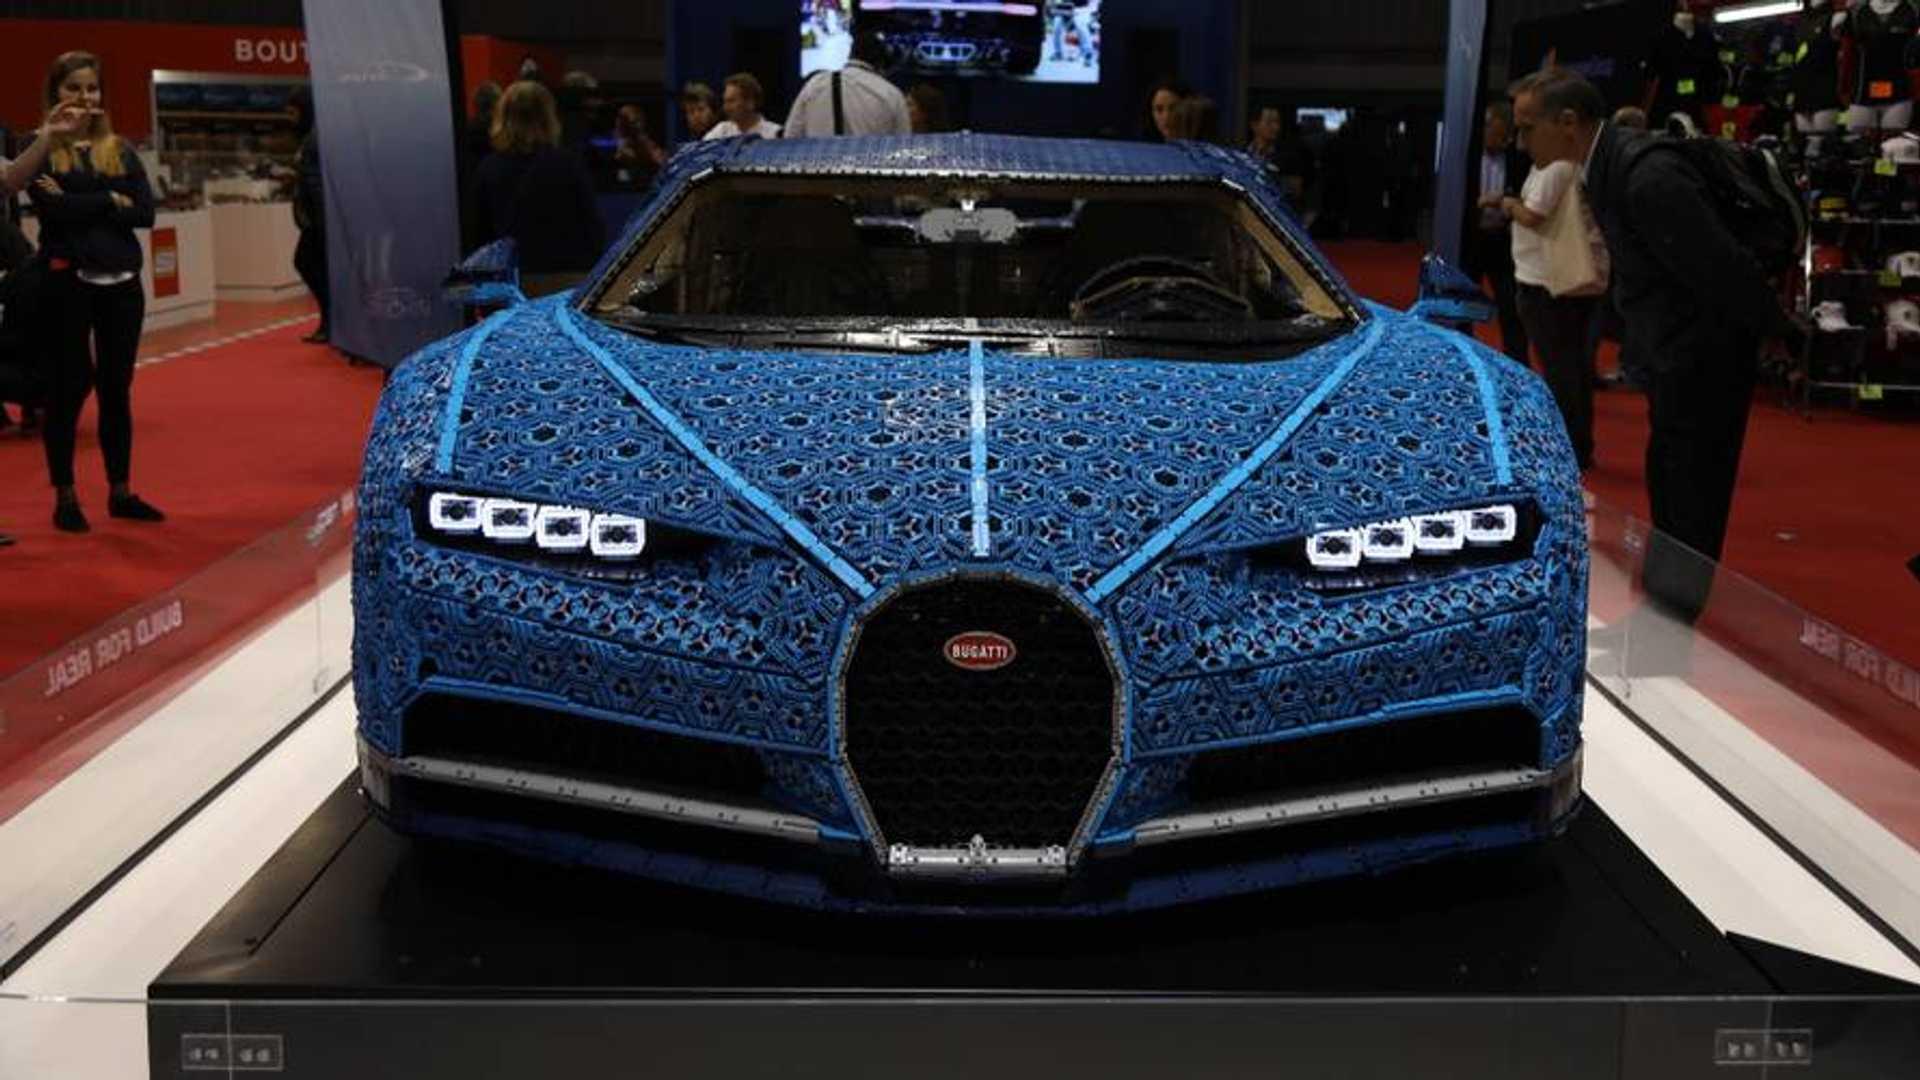 Lego Technic Presenta Un Bugatti Chiron A Tamano Real Actualizado